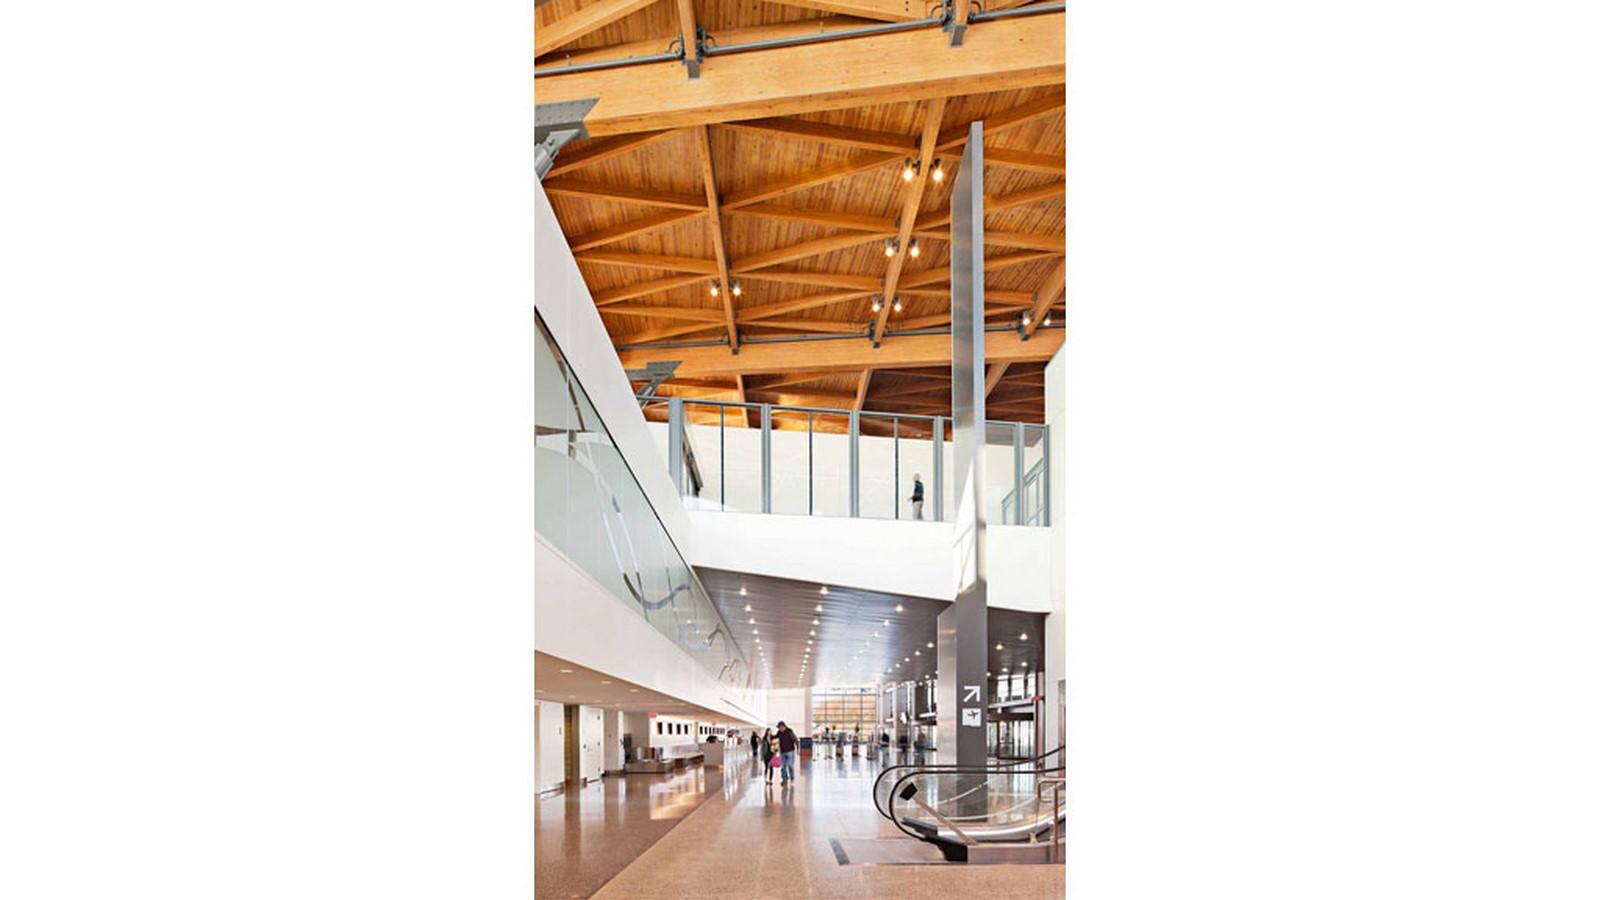 Terminal - Portland International Jetport - Sheet2